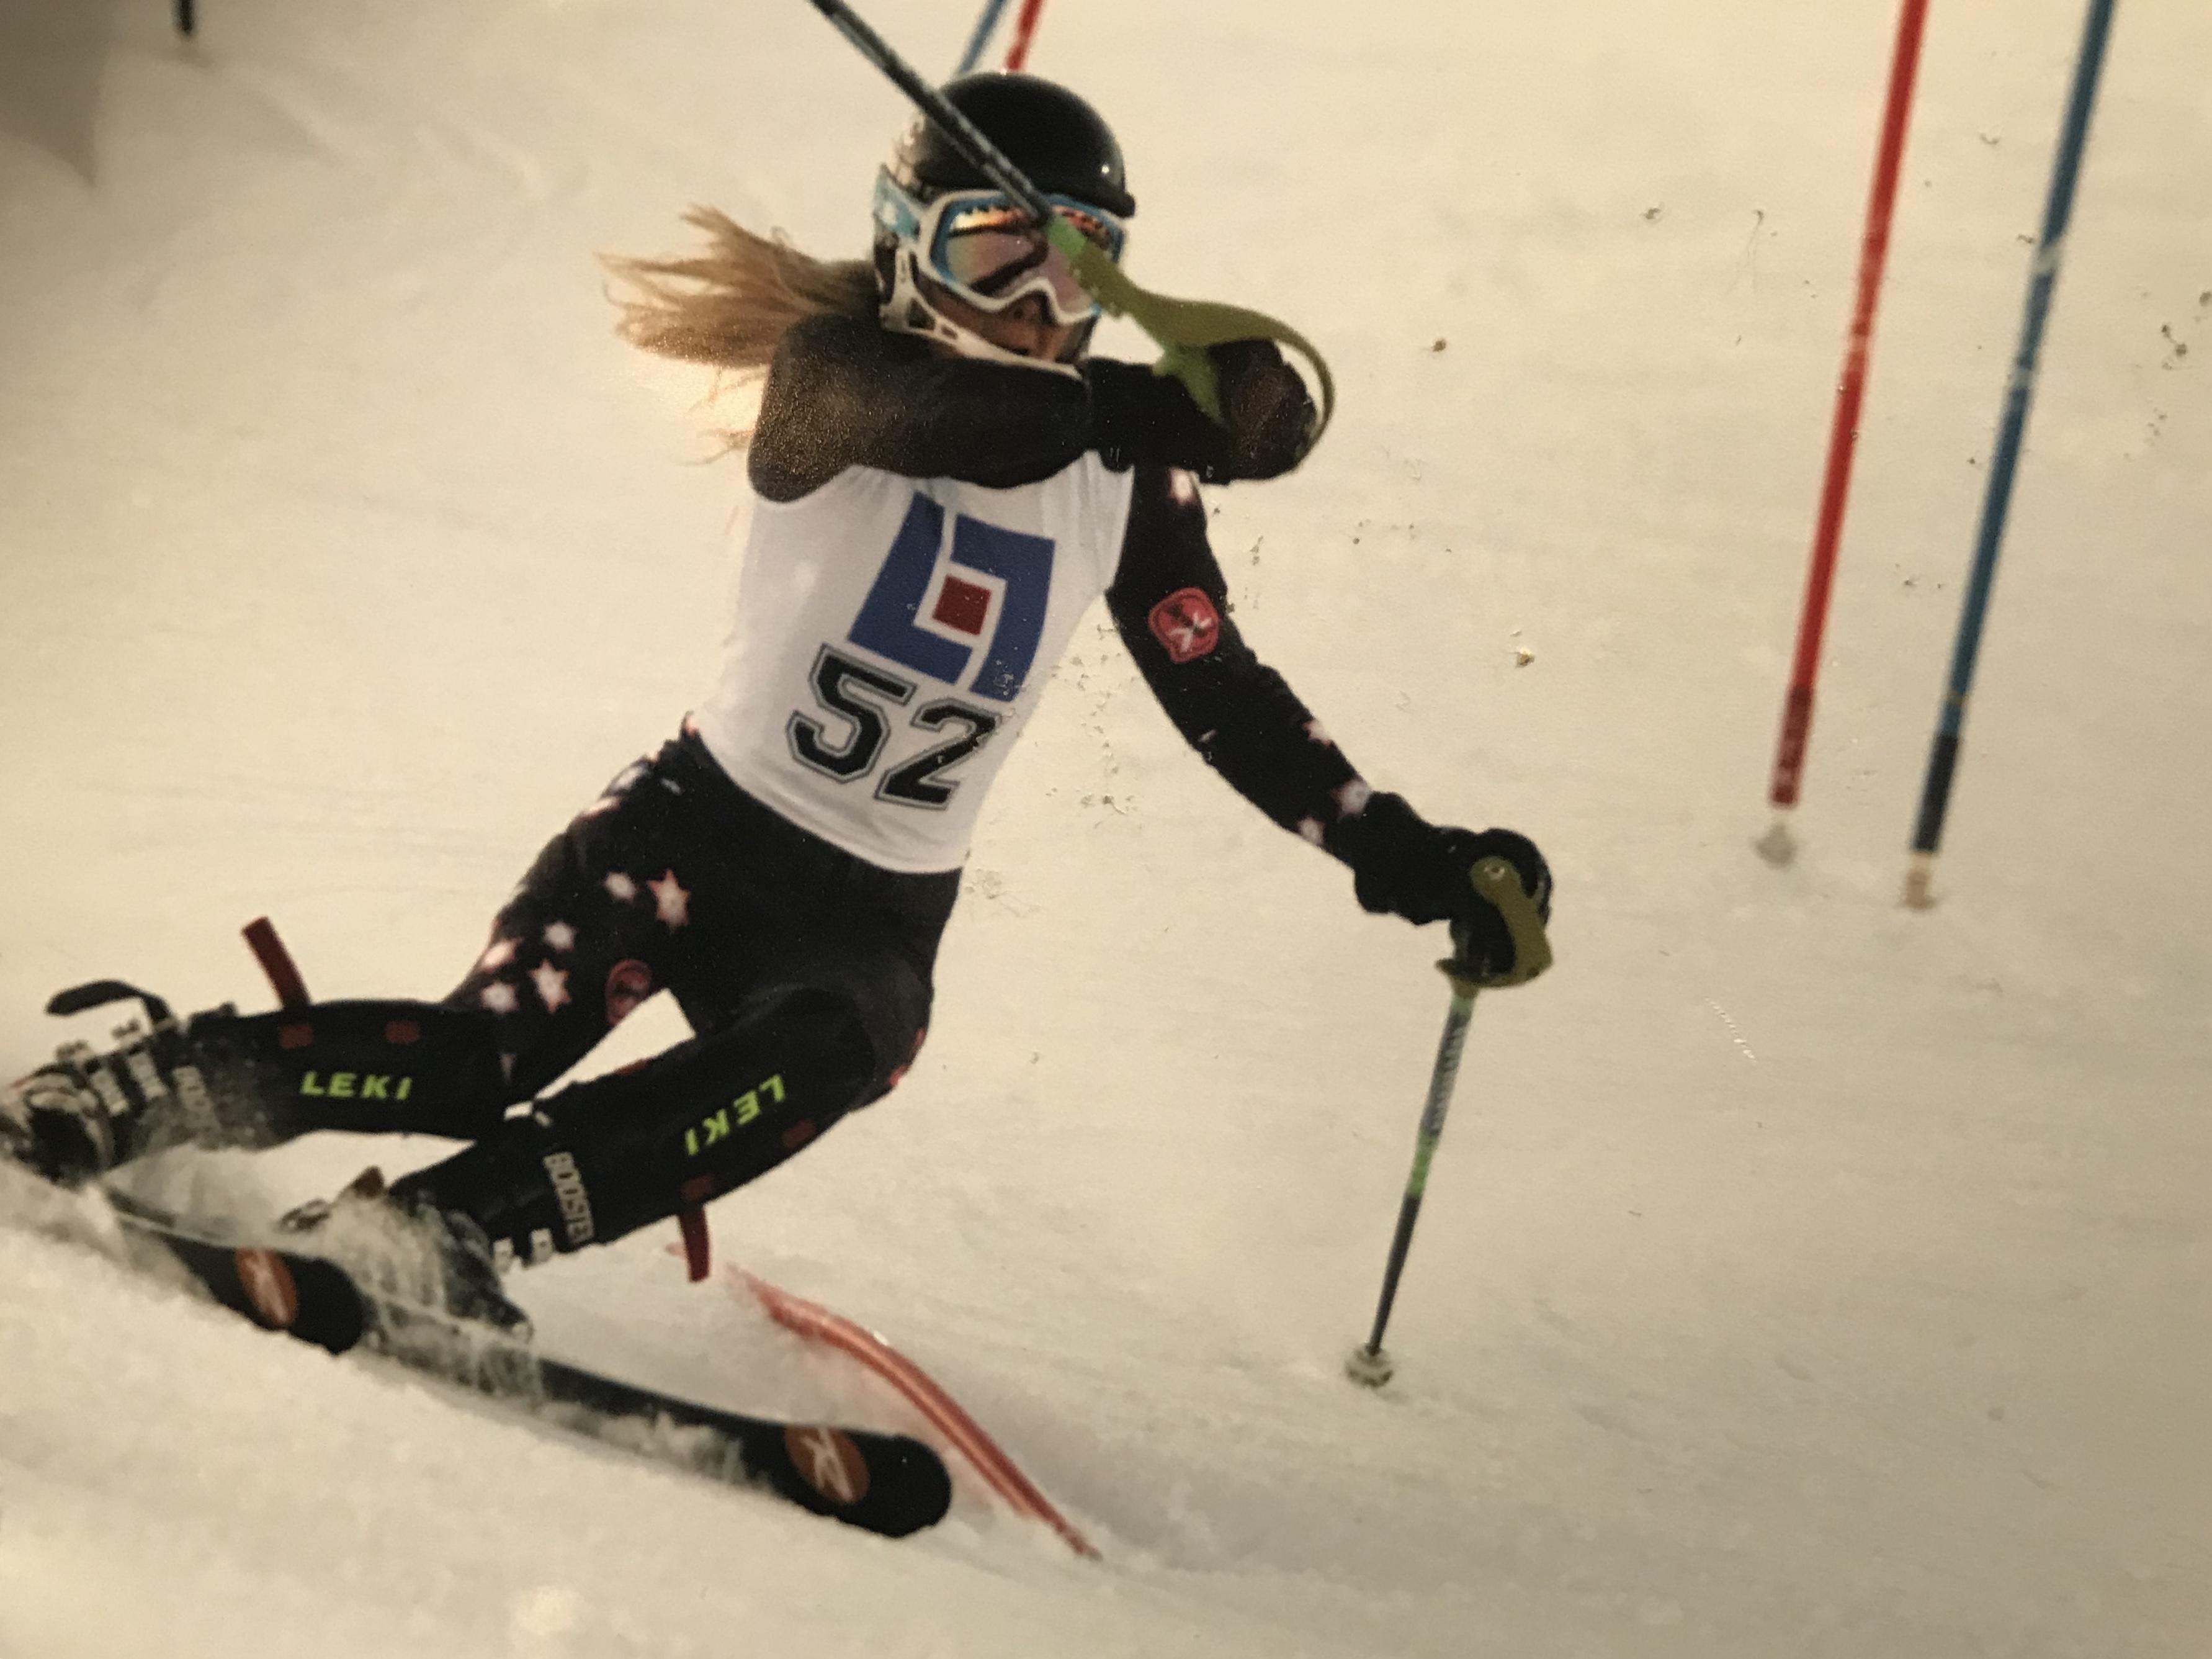 Agnes kör FIS-slalom